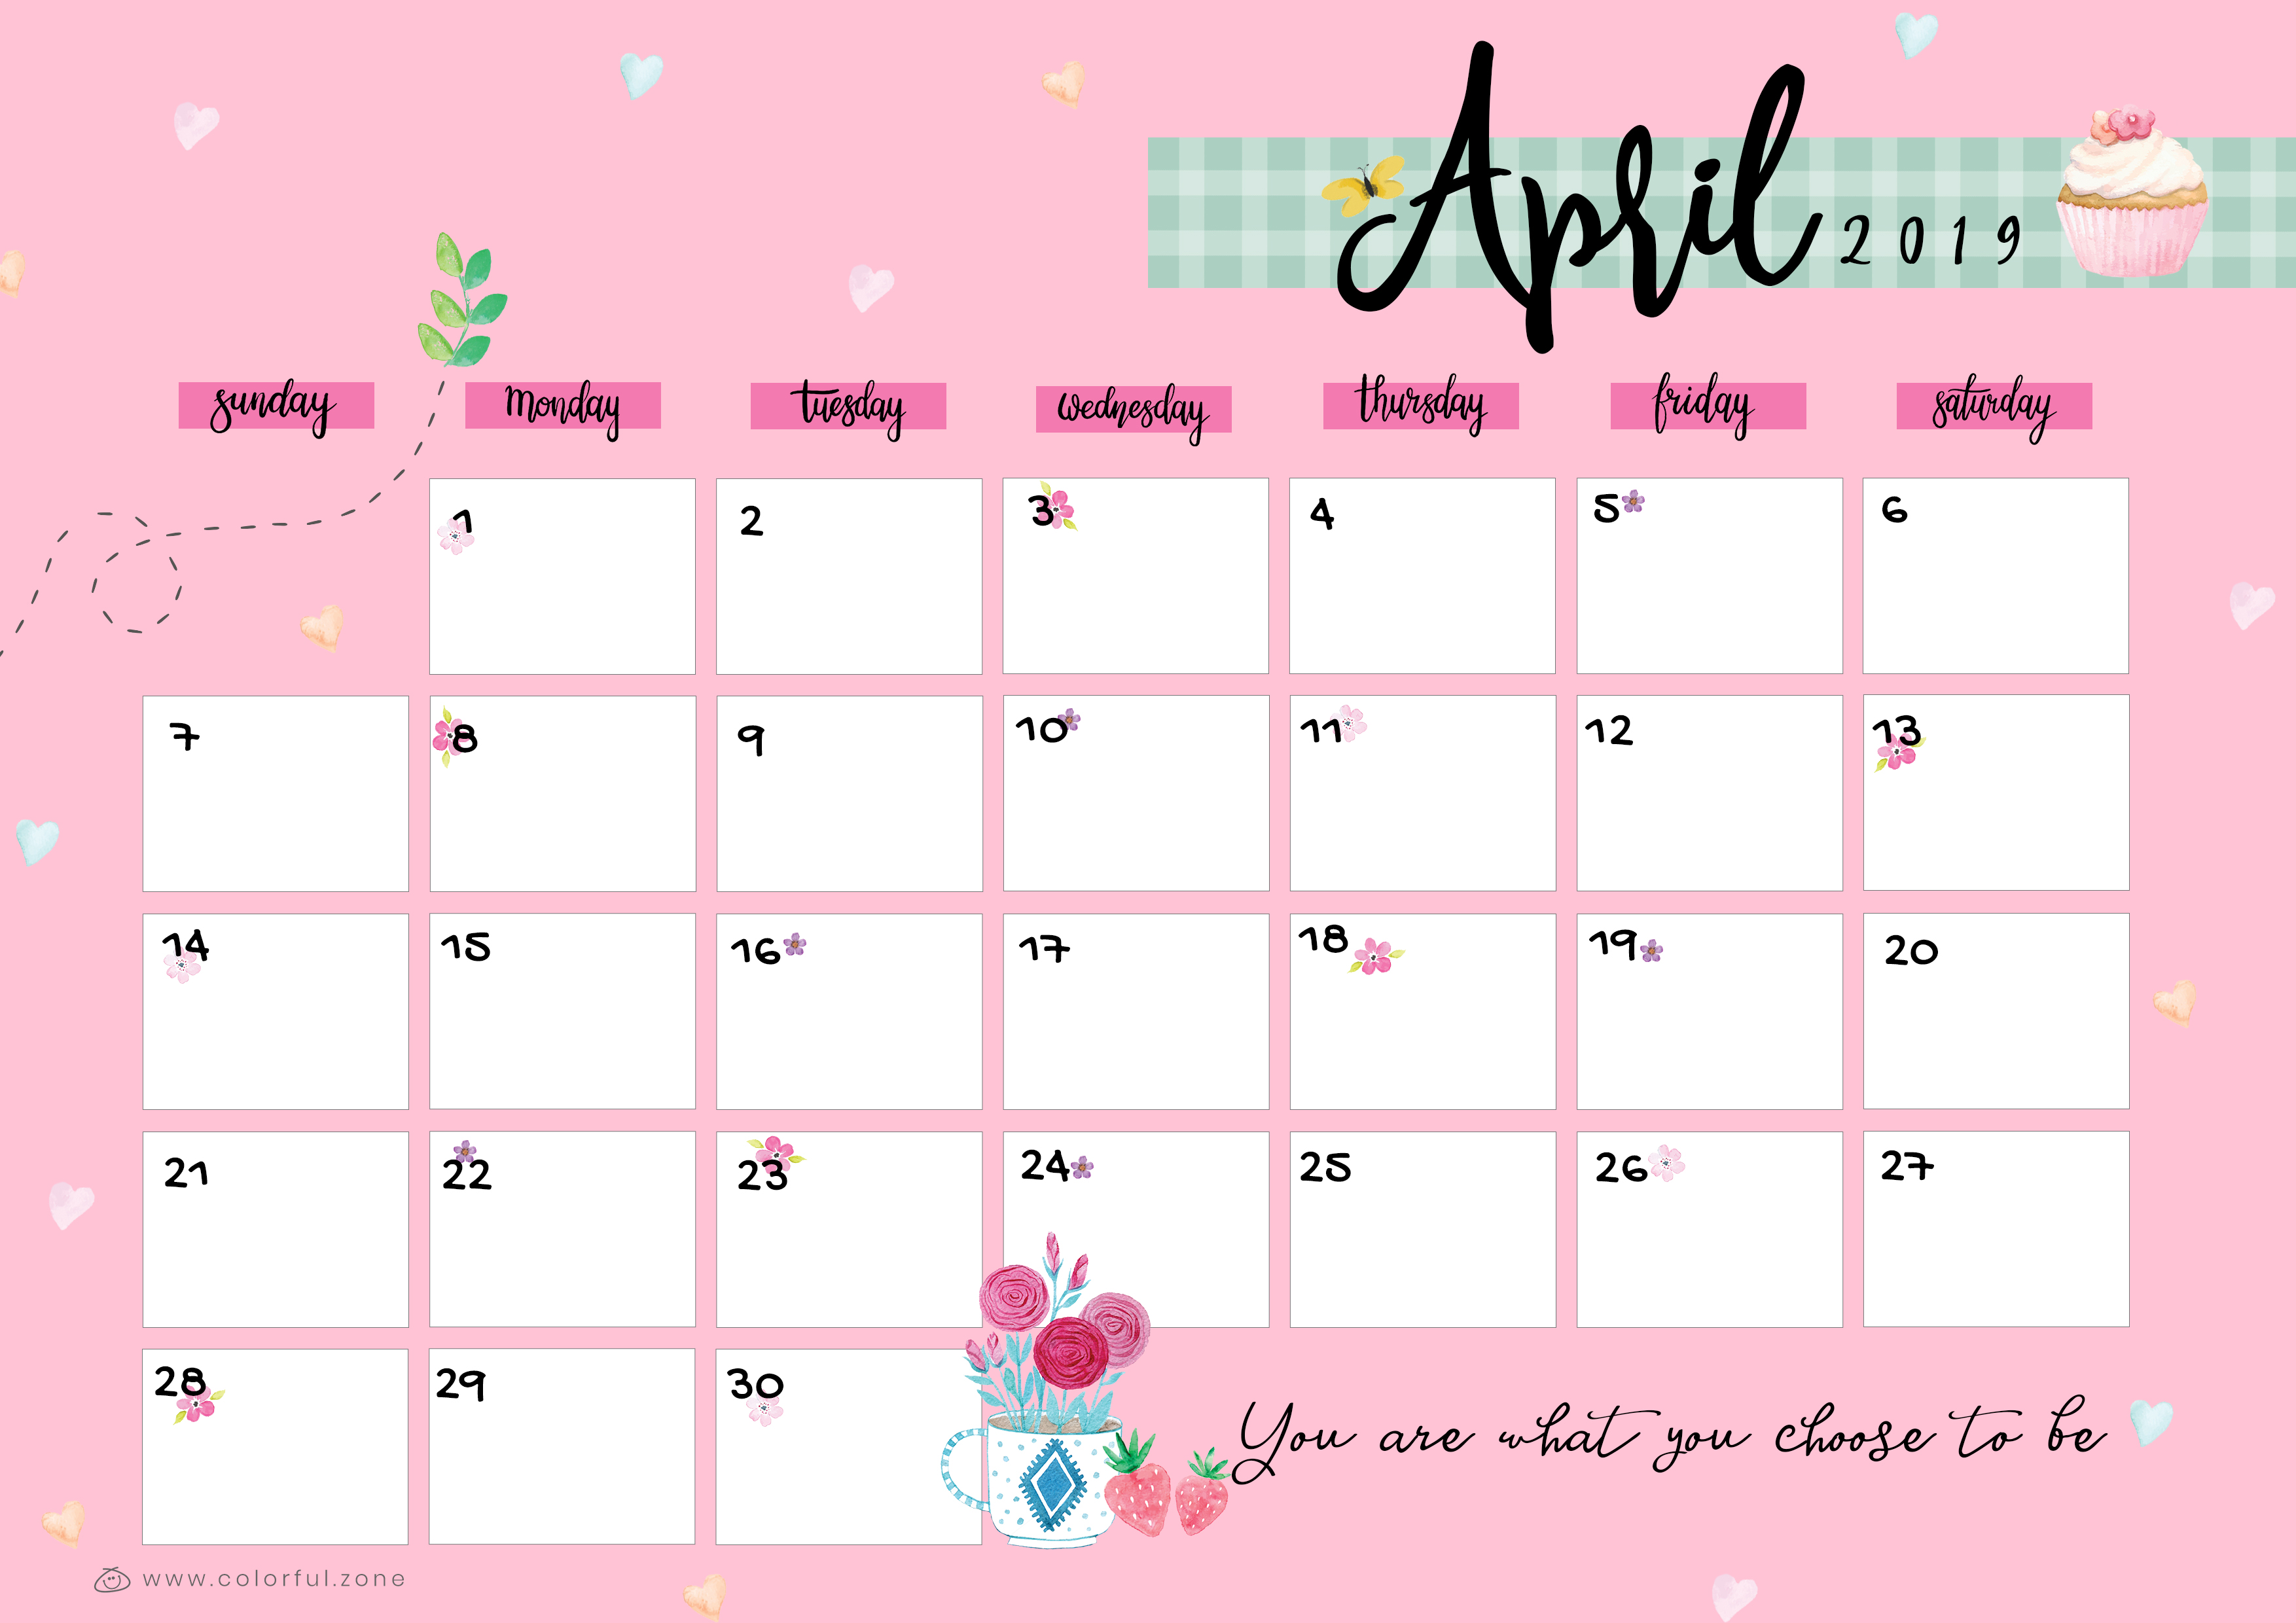 April Printable Colorful Calendar 2019